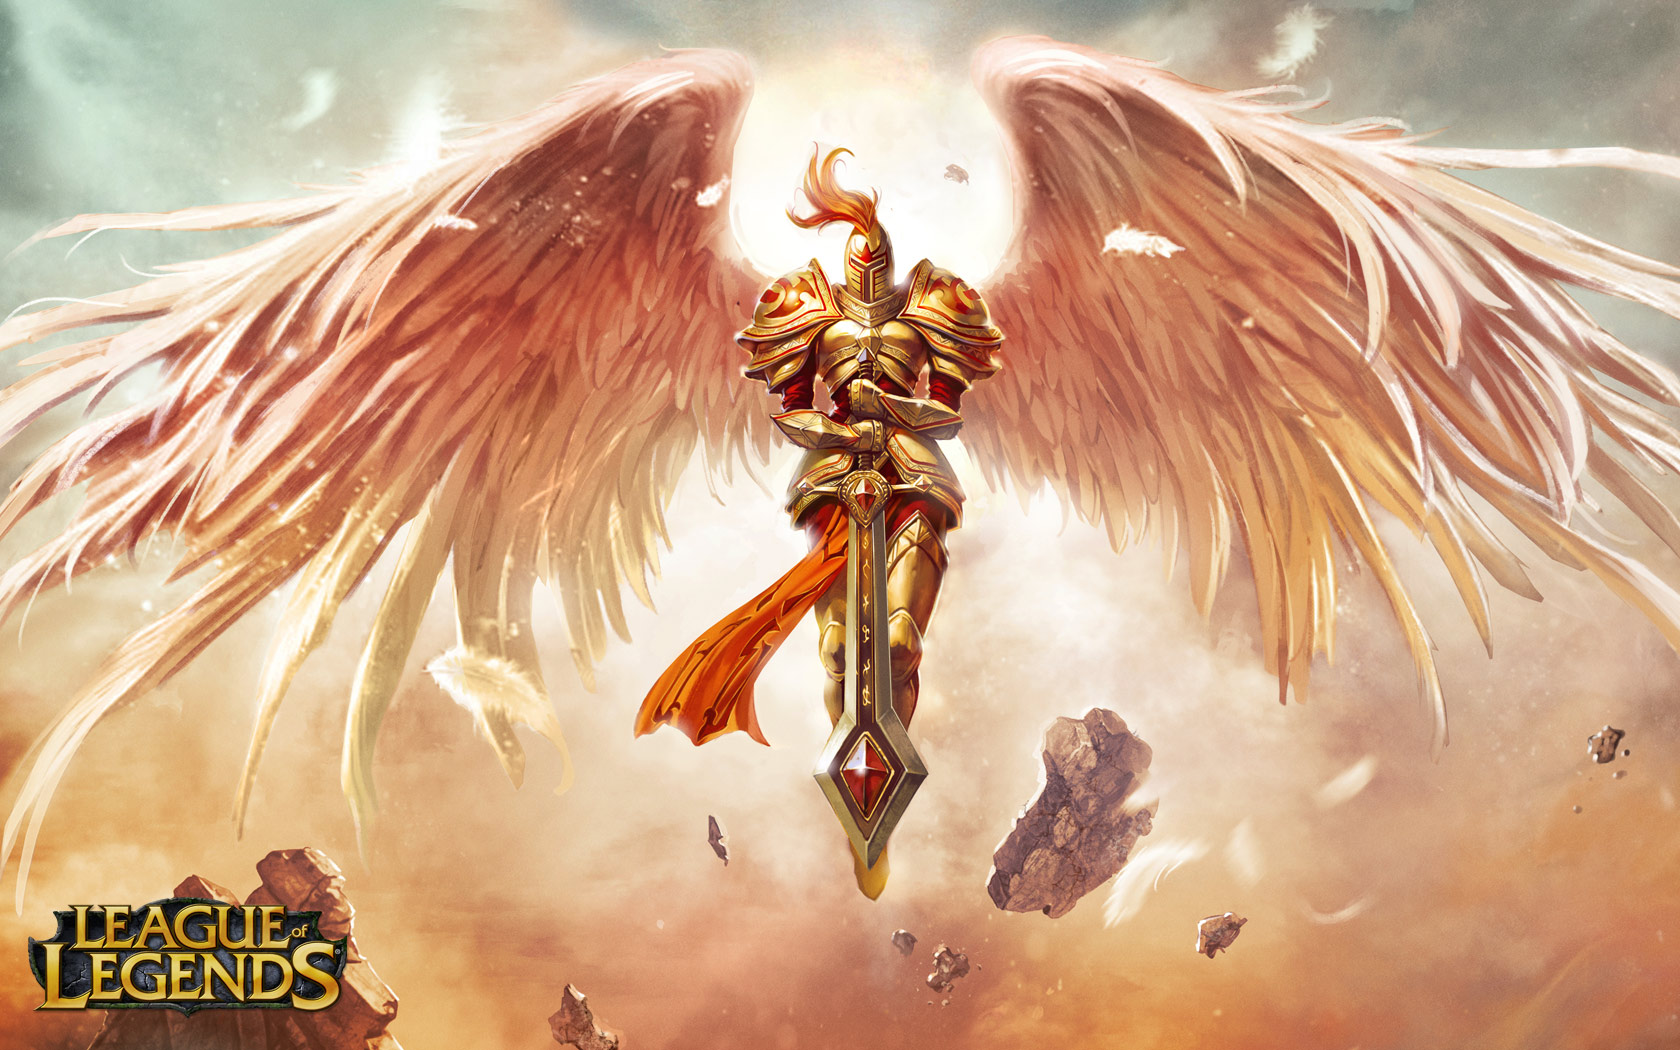 League of Legends wallpaper 8